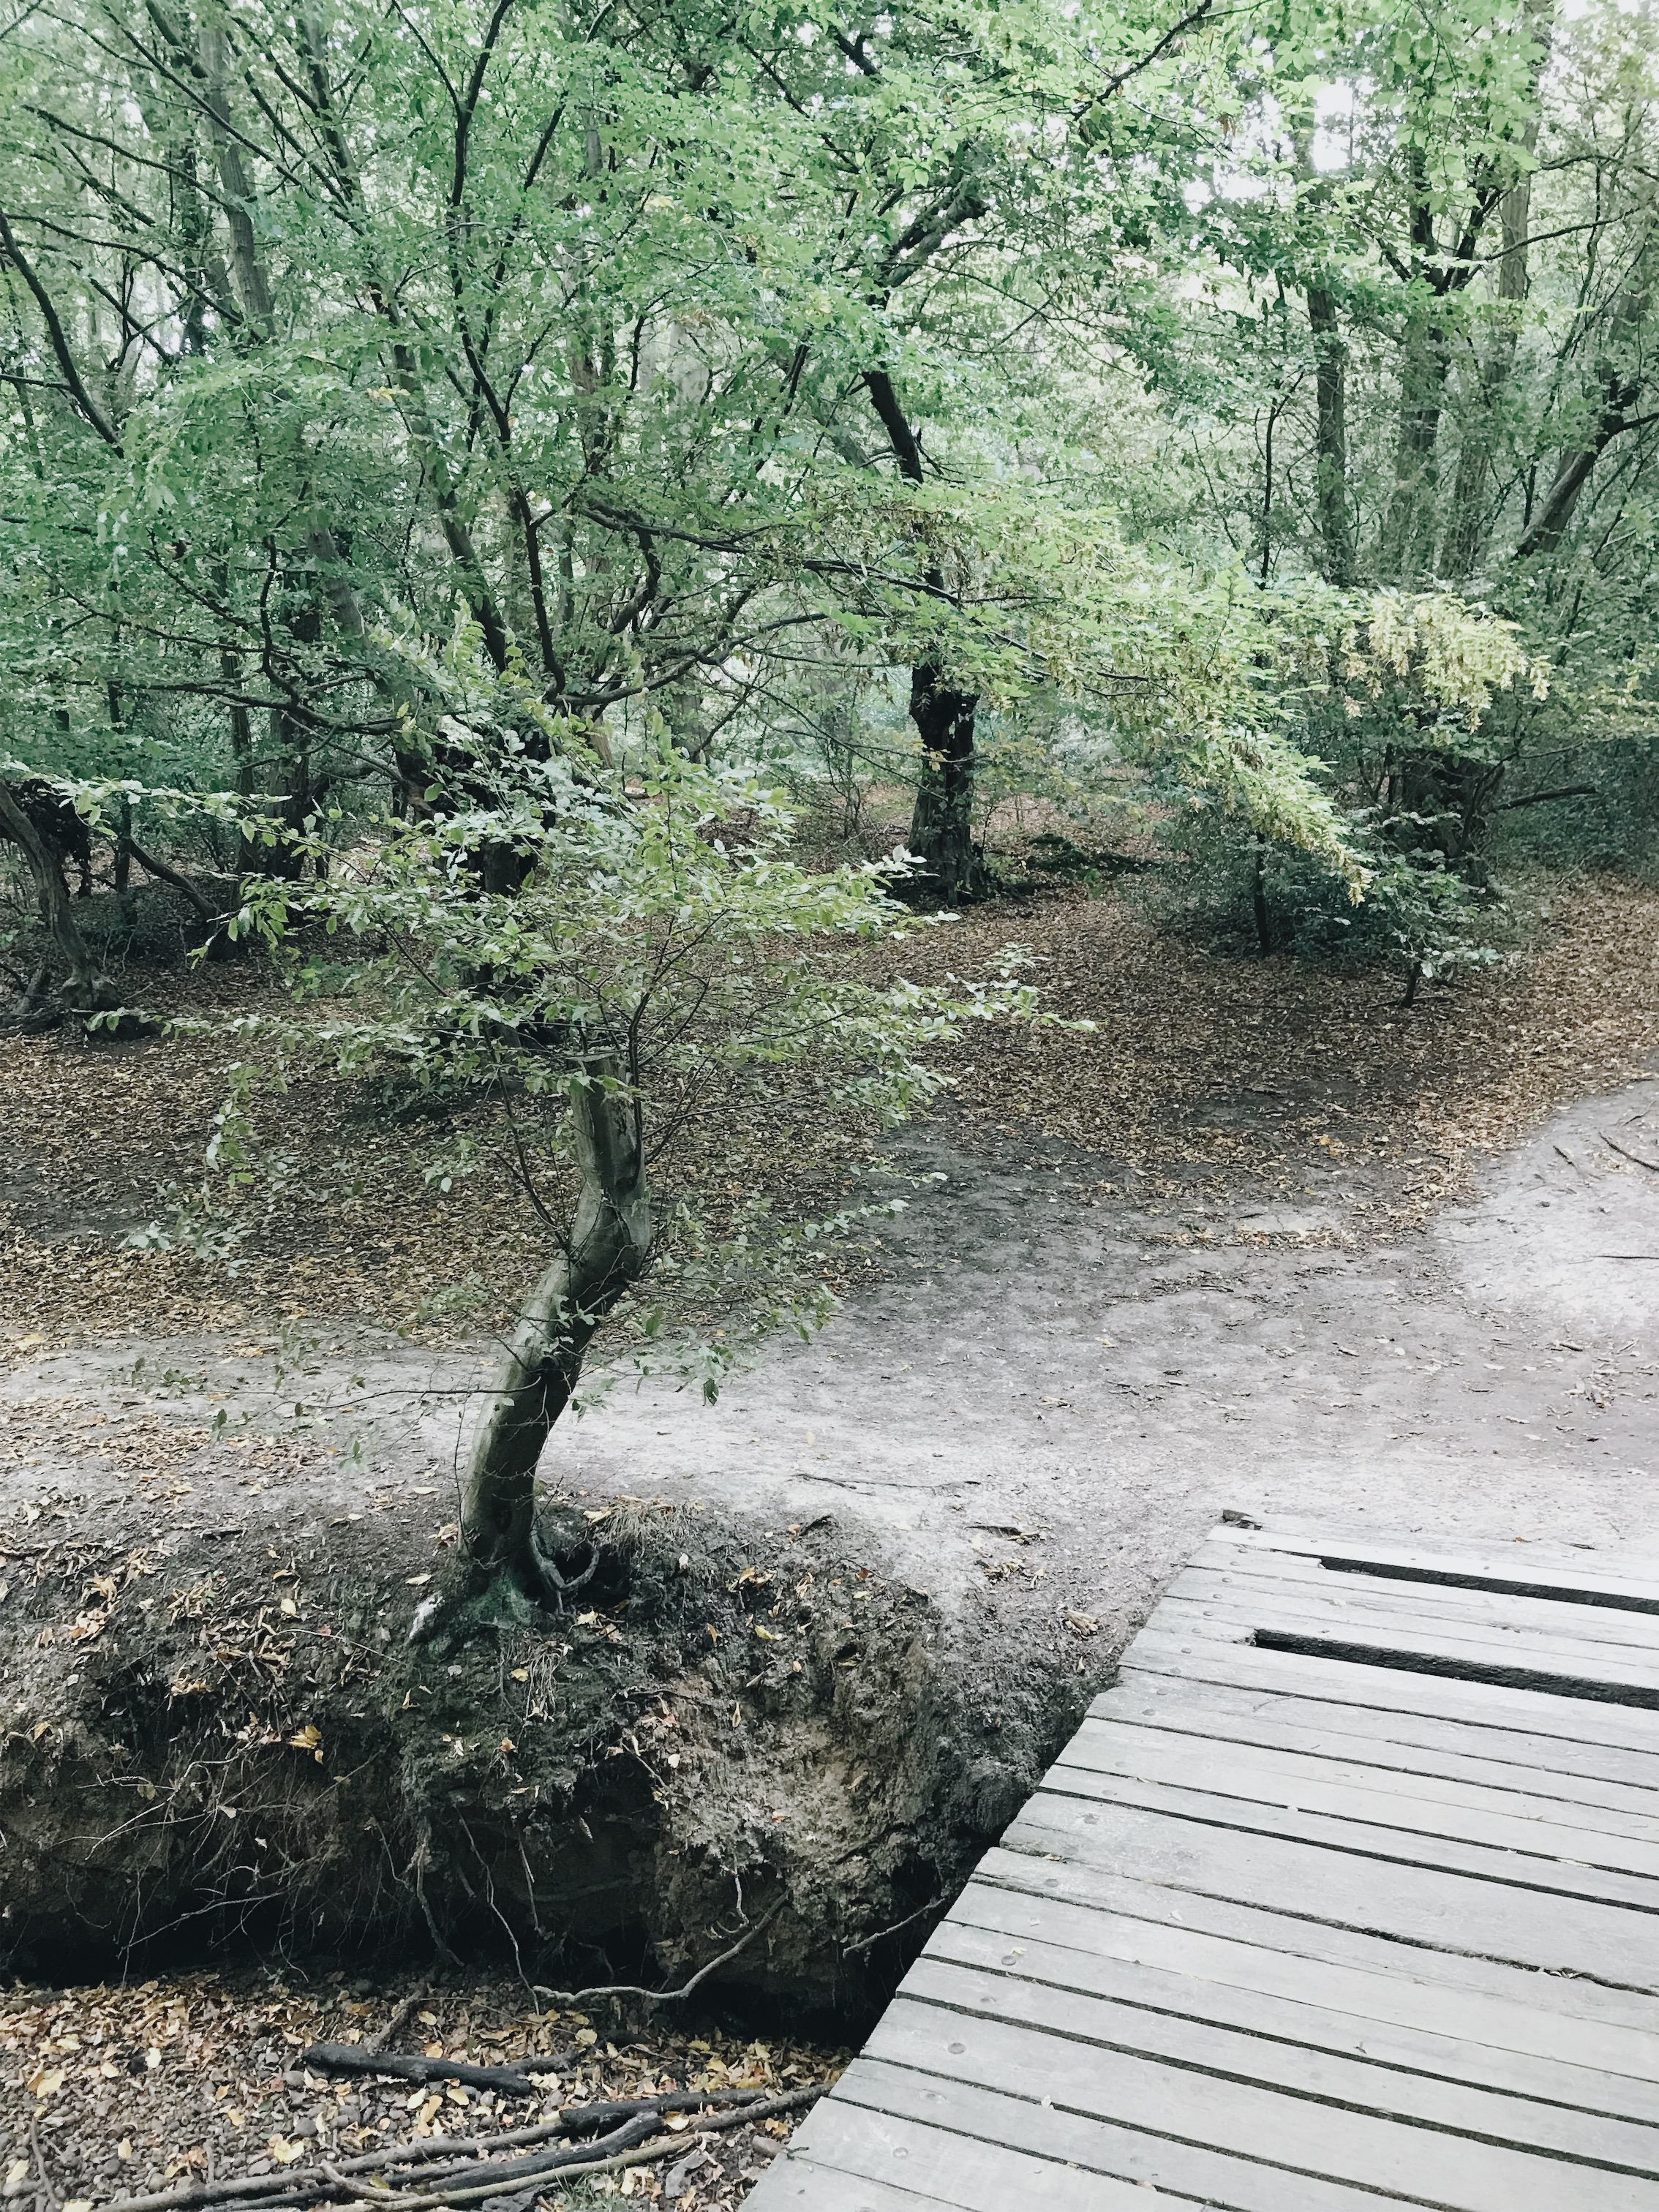 JPEG image-62D53E4C7A1D-19.jpeg